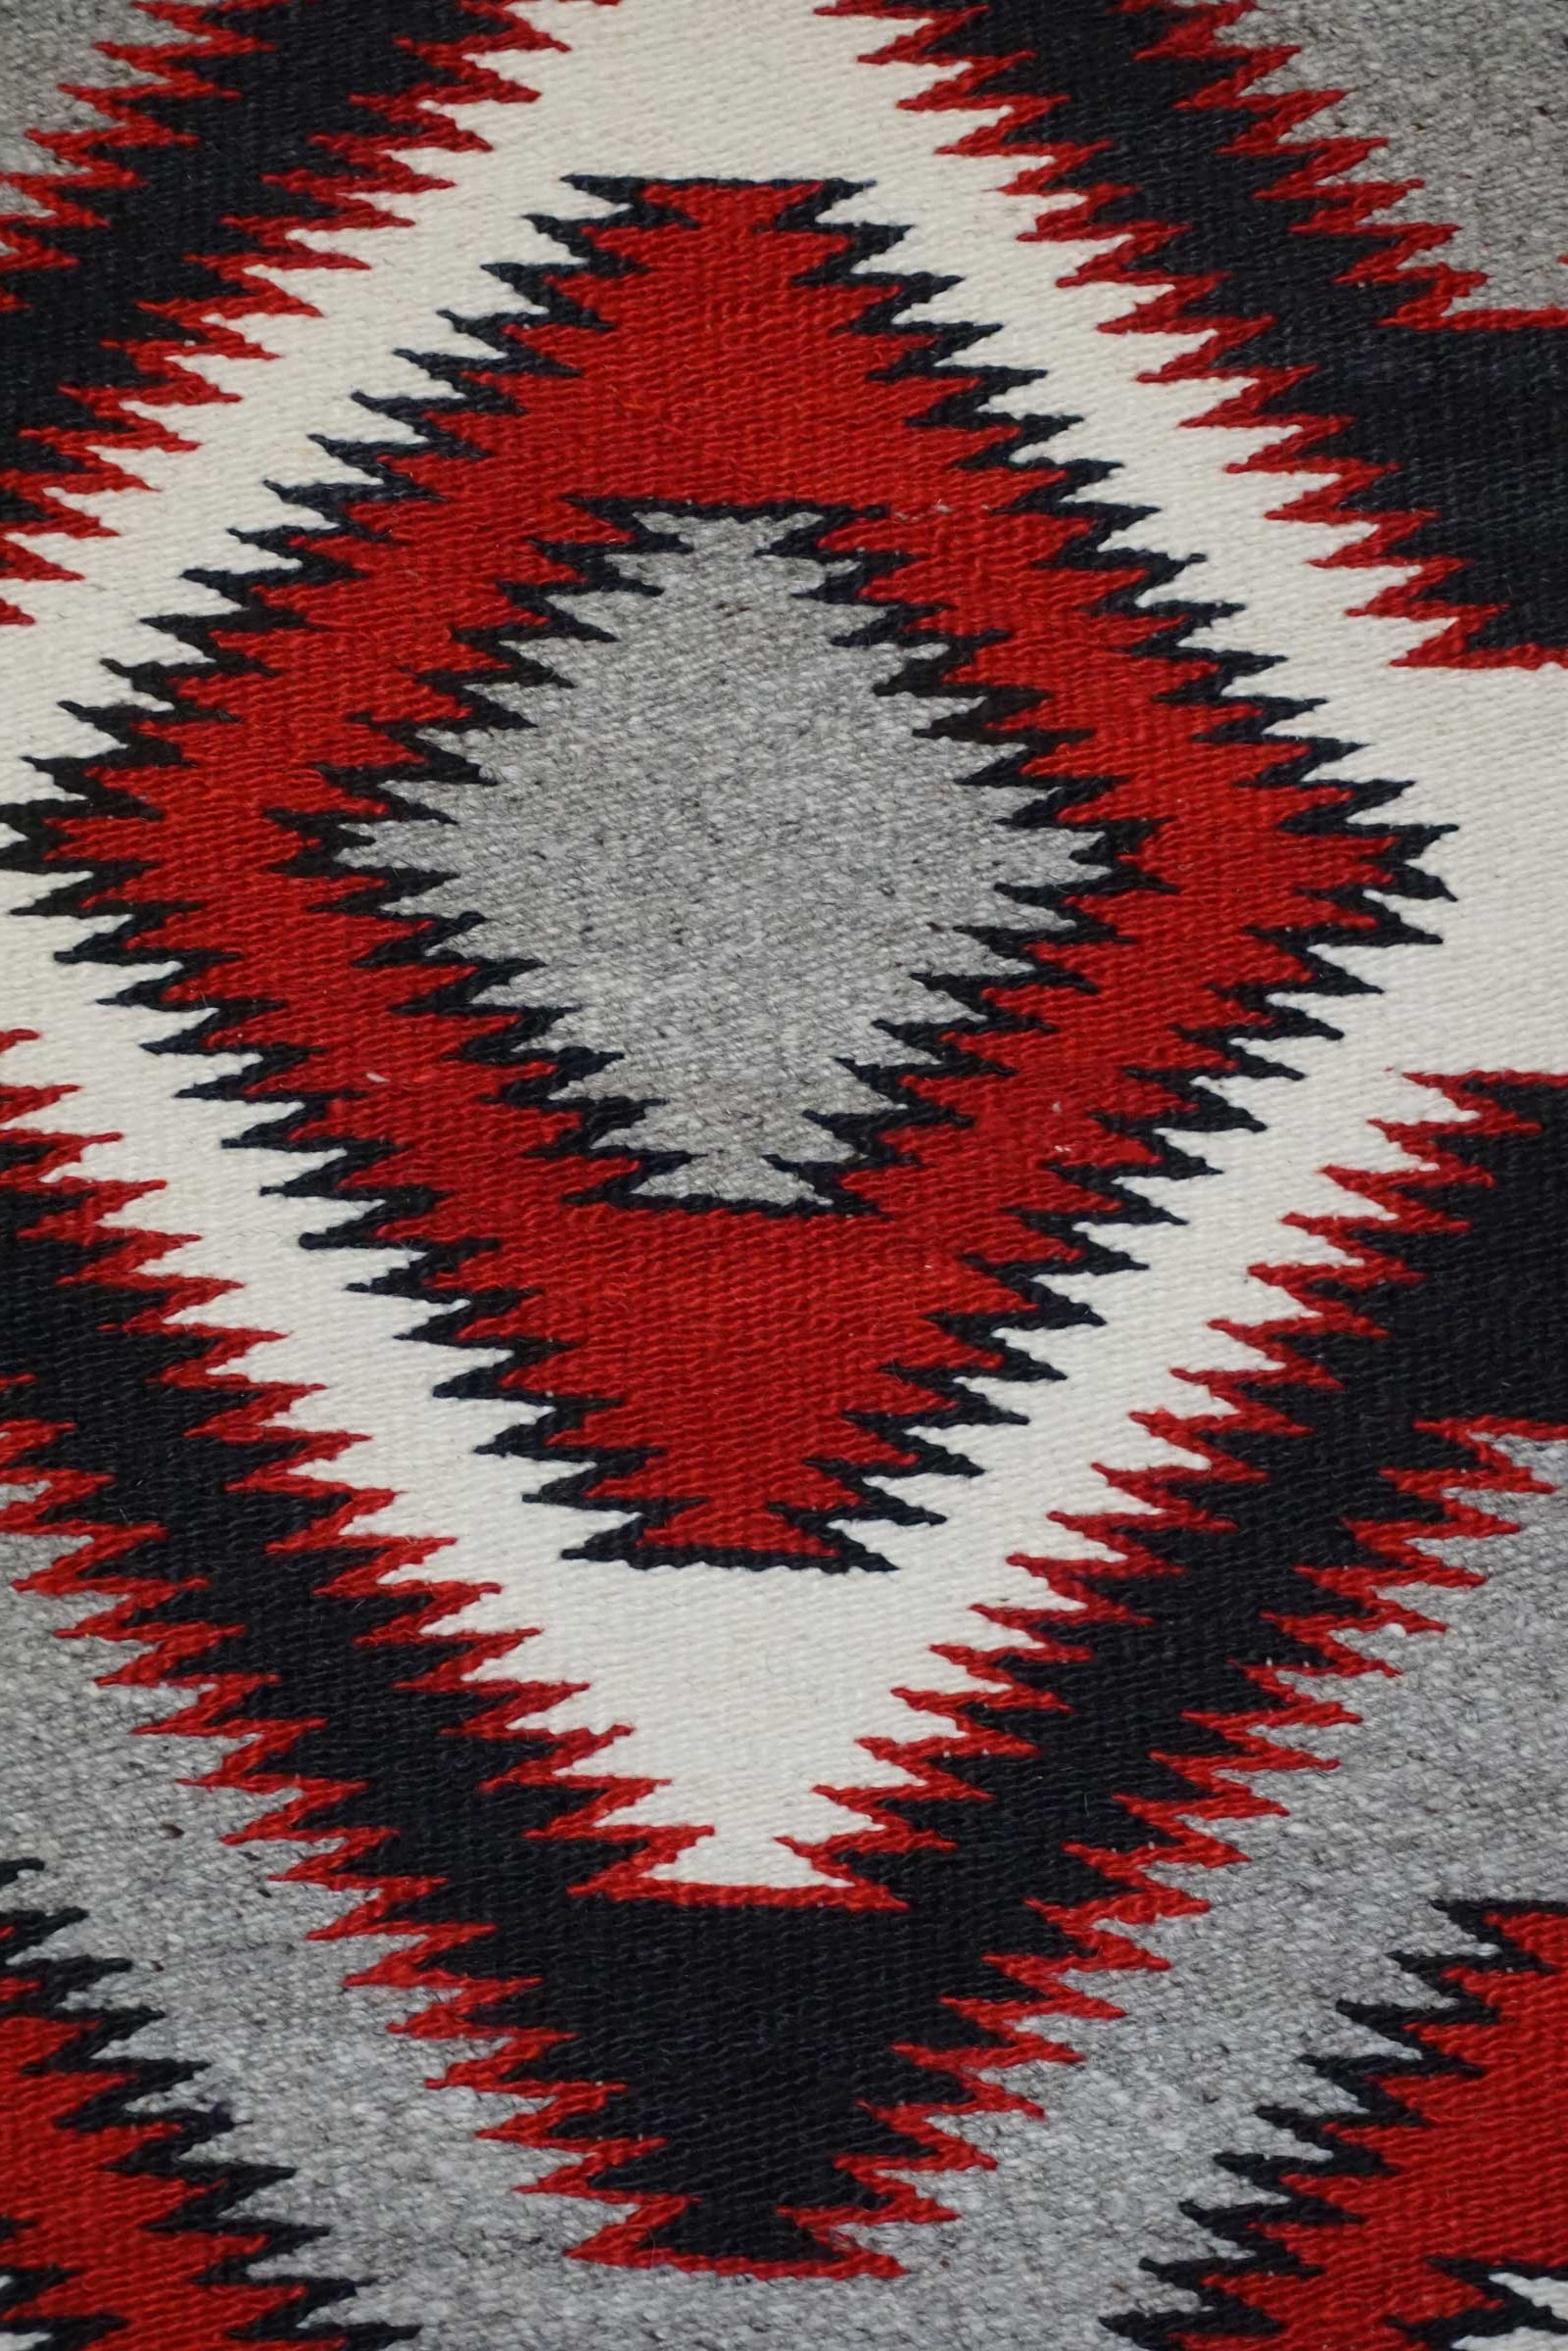 Red Mesa Navajo Rug 871 Charley S Navajo Rugs For Sale